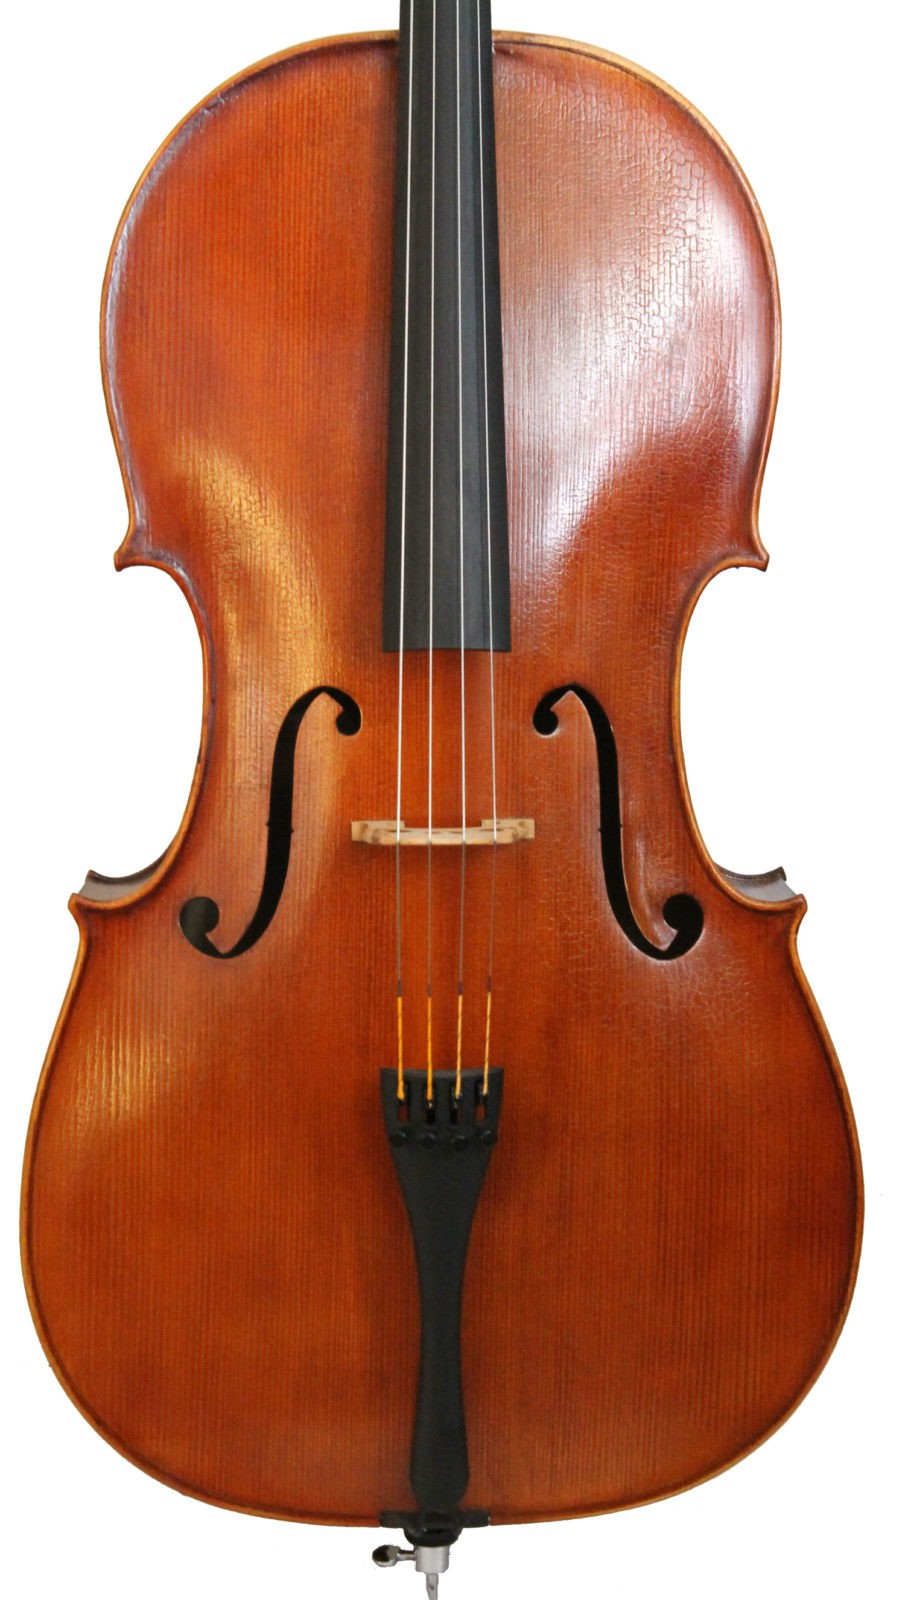 Gennaro De Luccia cello